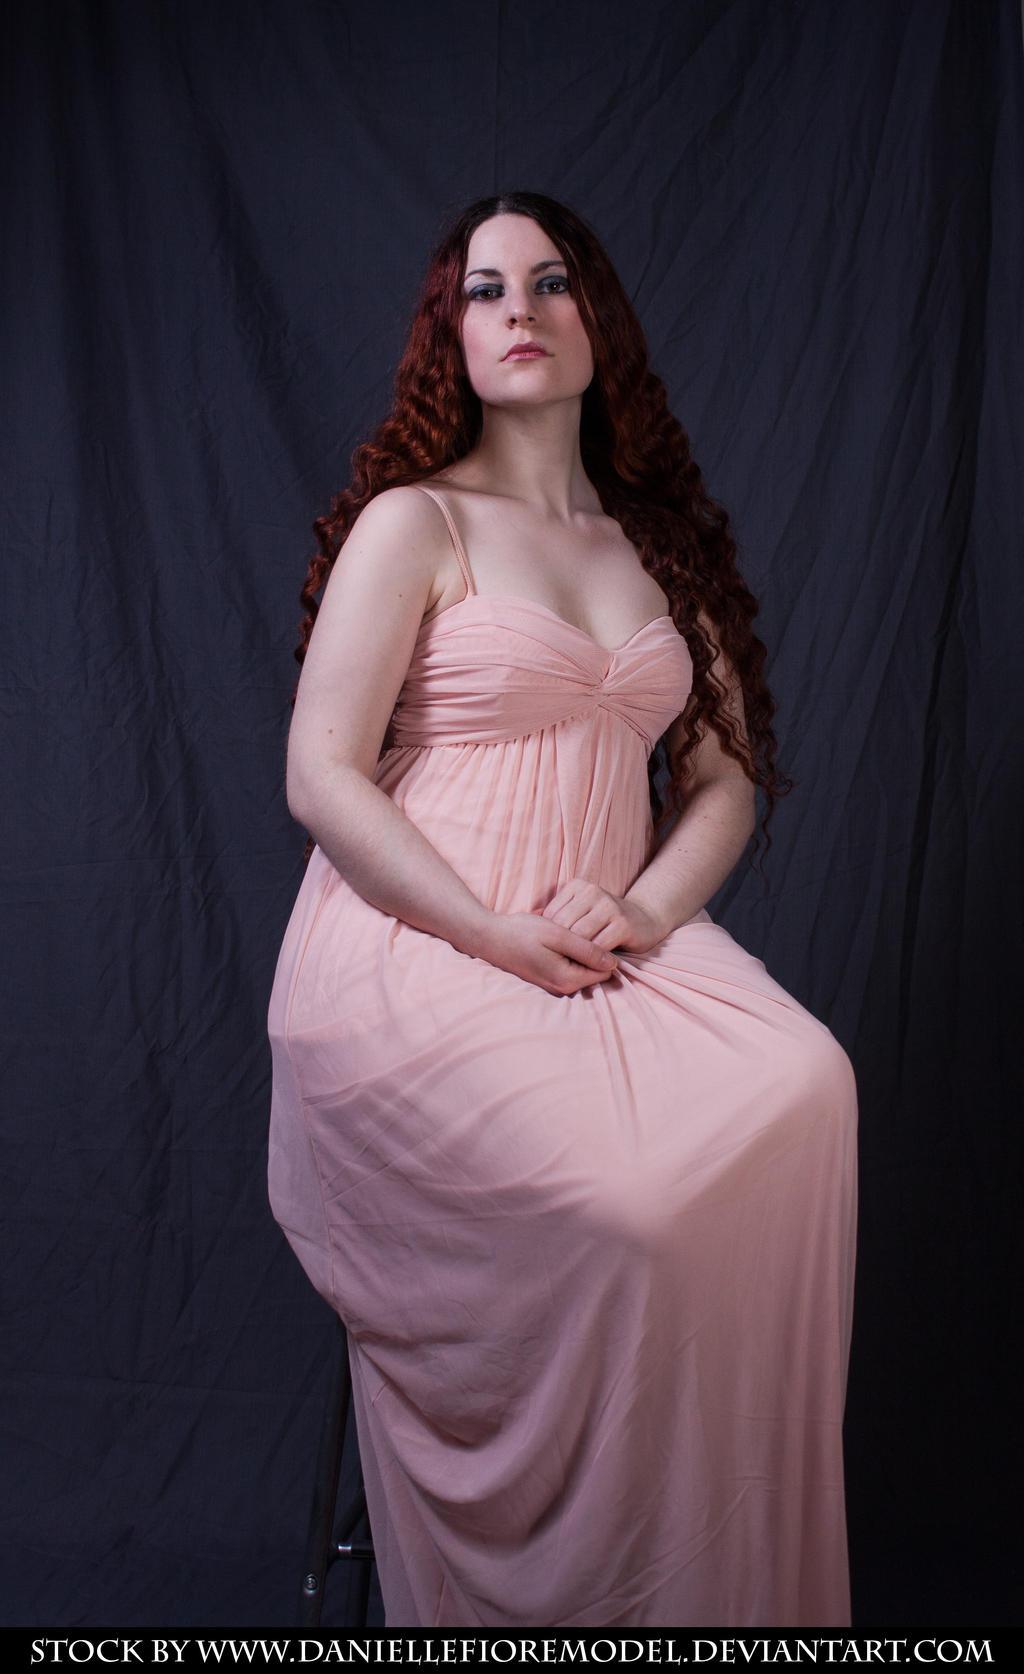 Venus Stock 8 by DanielleFioreModel